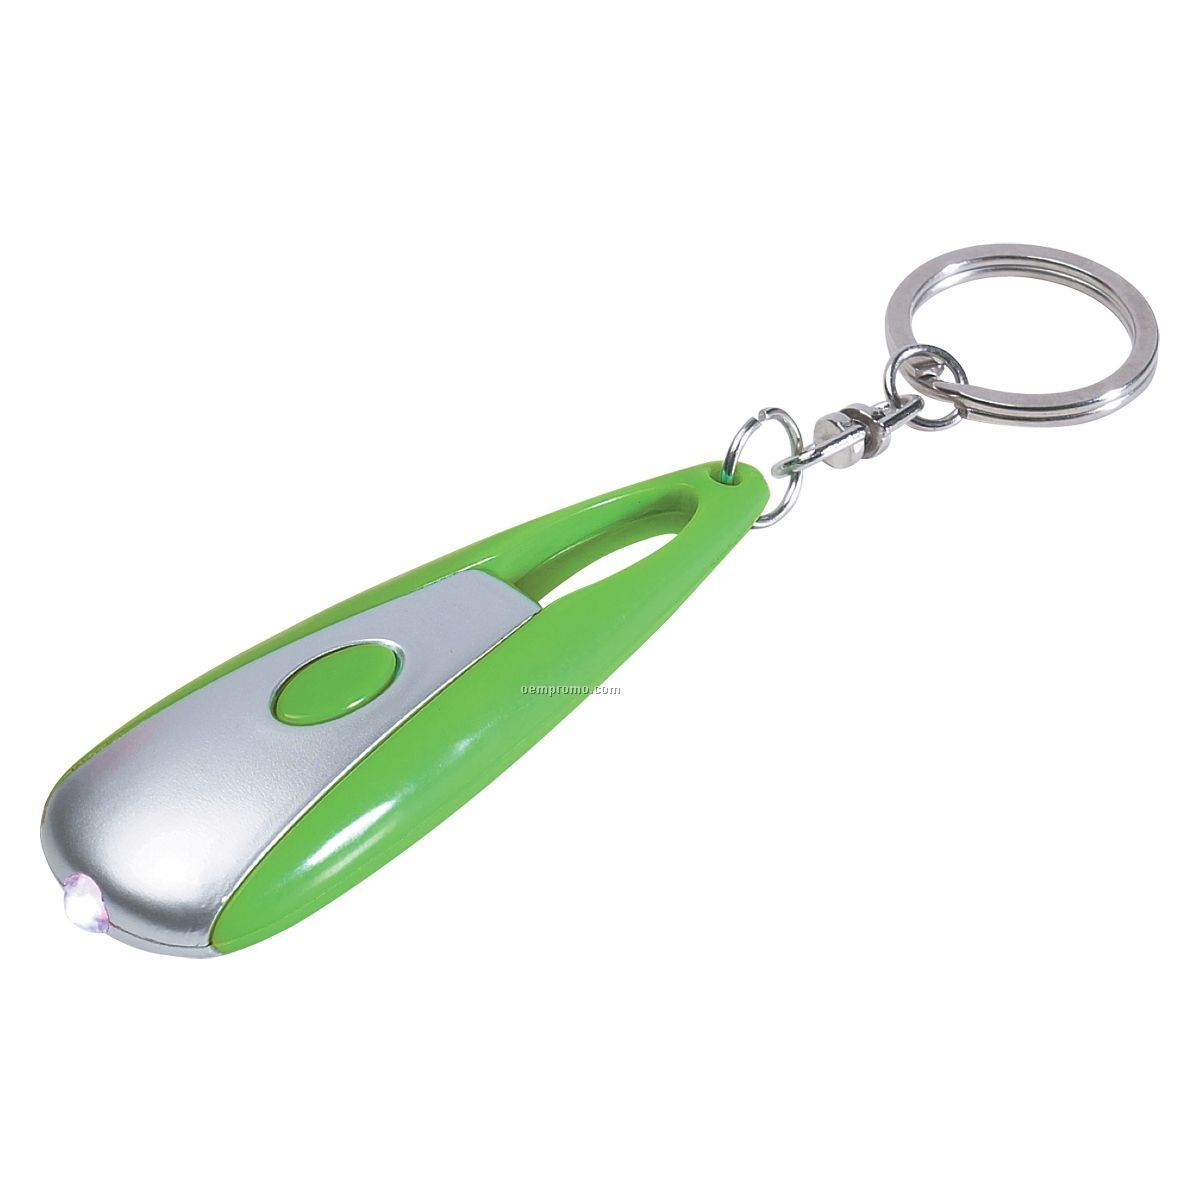 Cosmic Black Flashlight Keychain